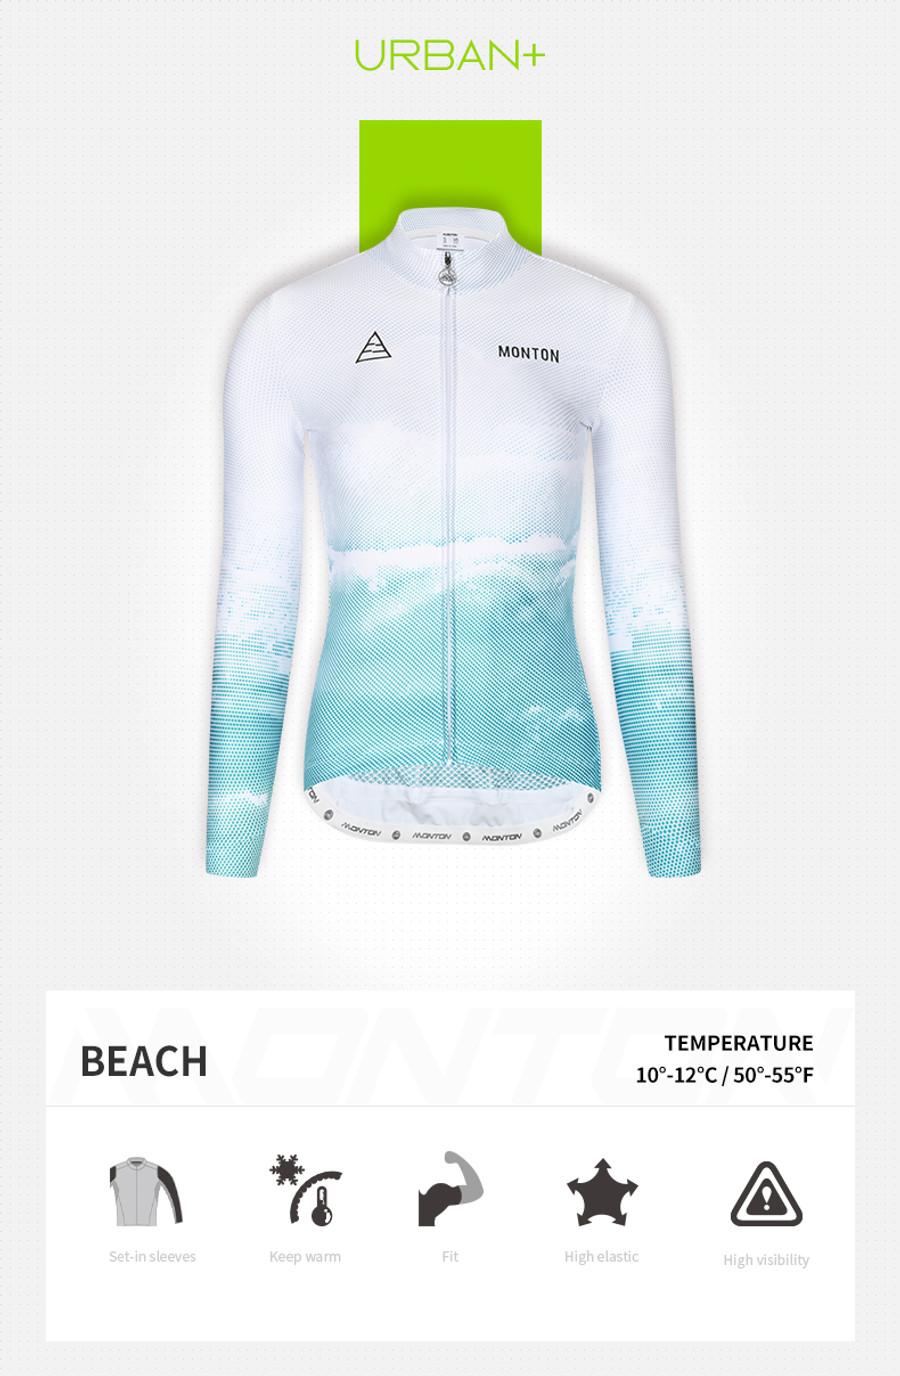 Women's Urban+ Beach Thermal l/s Jersey